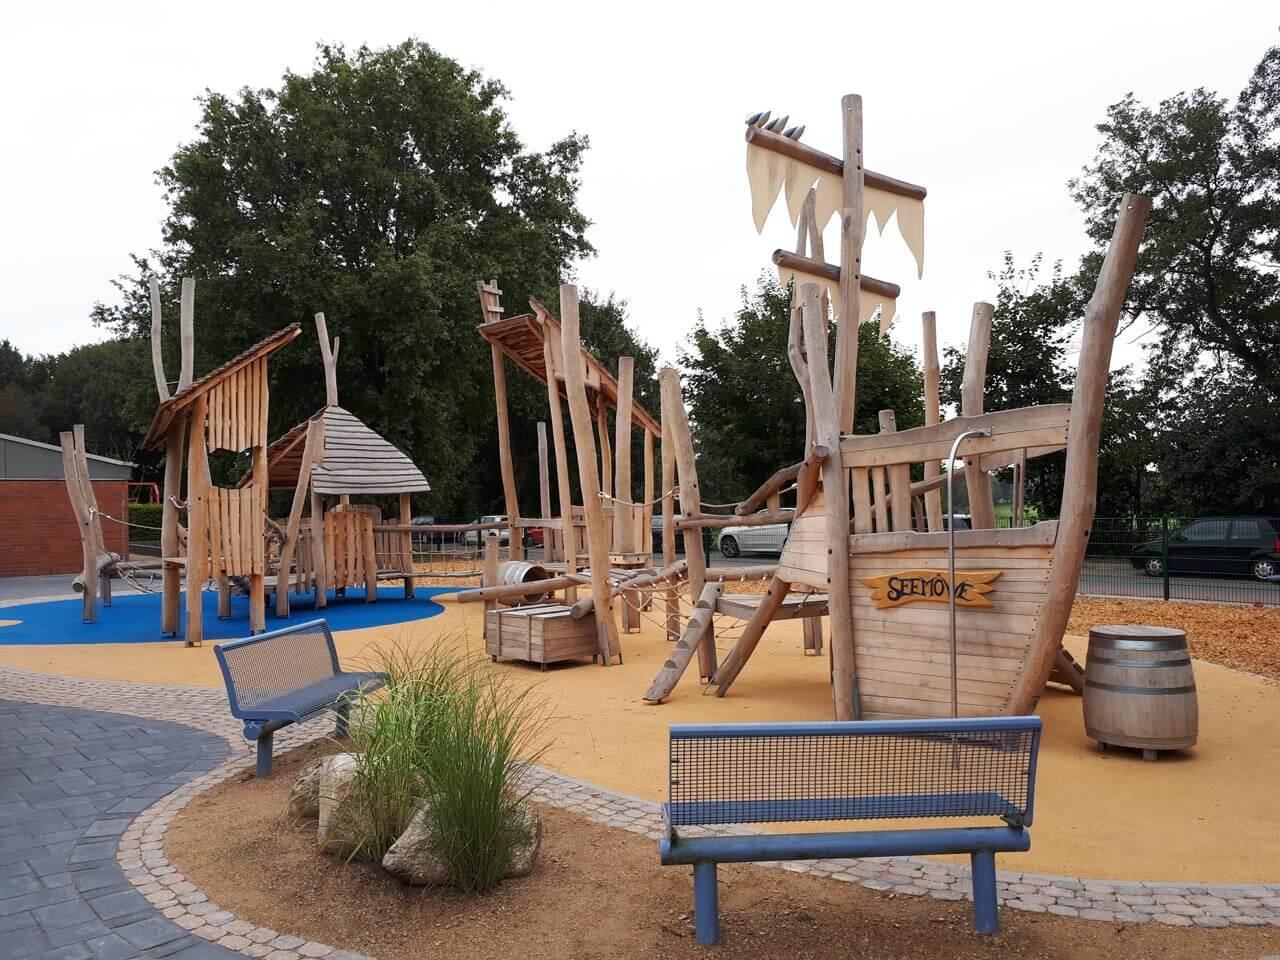 Seepark Schule Wesermünde